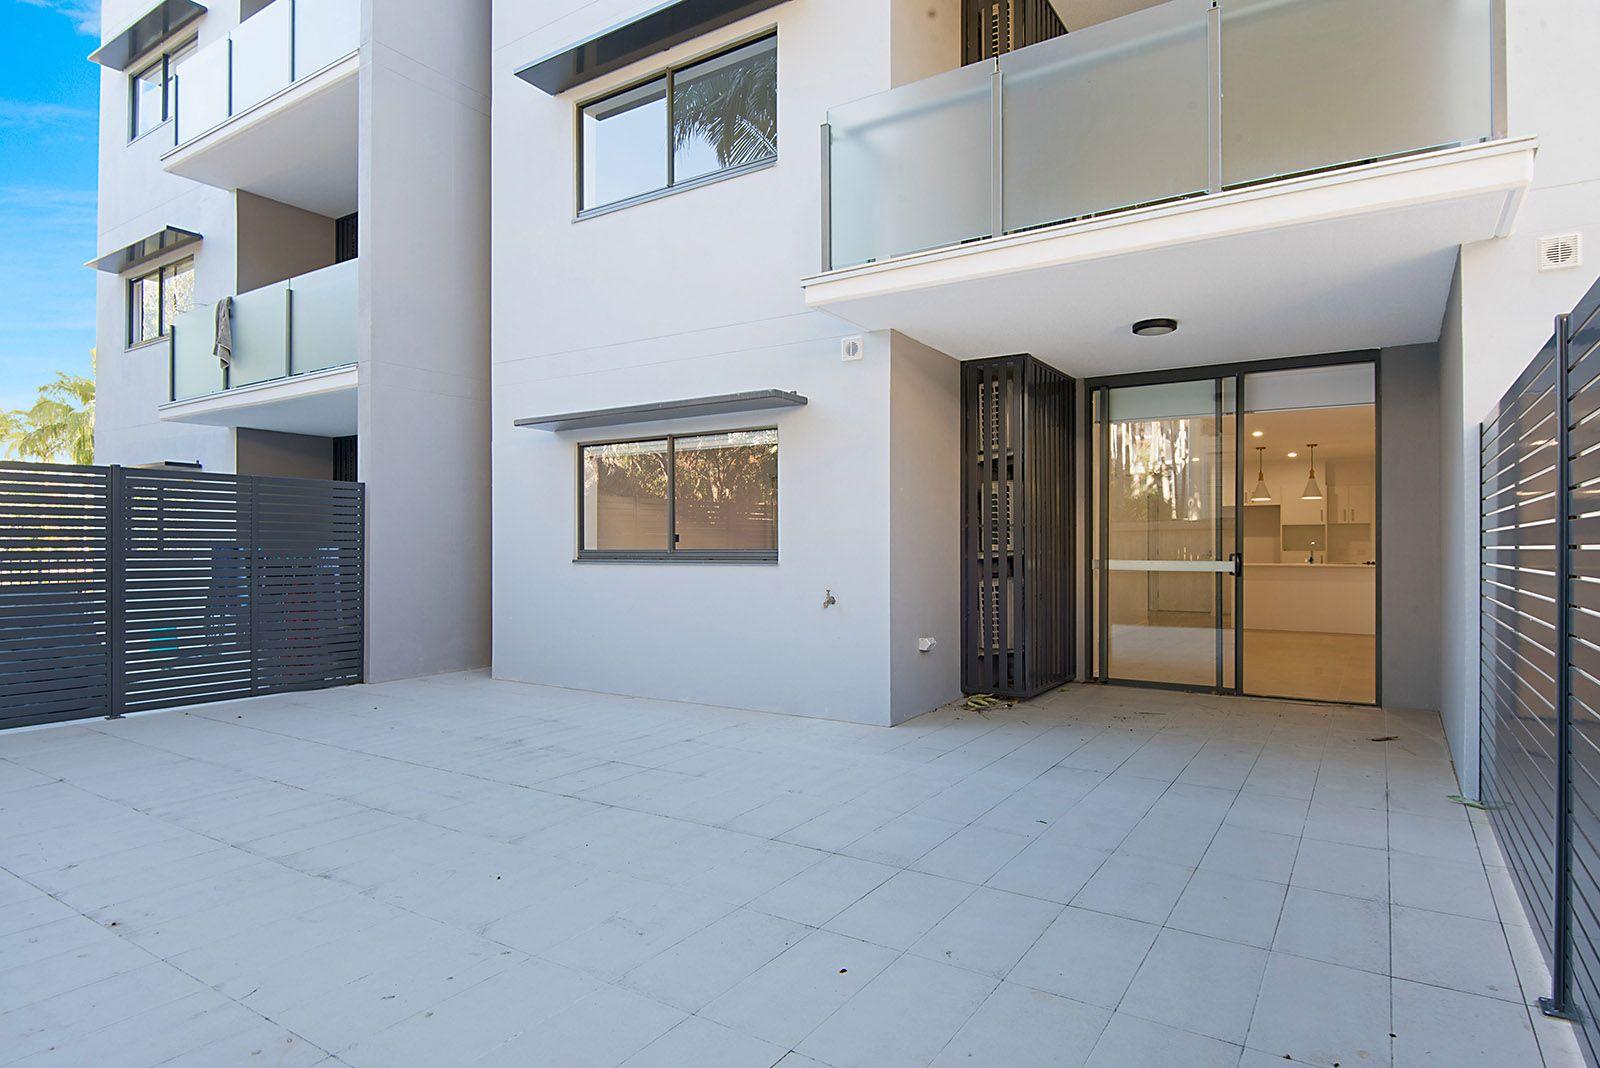 205/5-9 FOLKESTONE STREET, Bowen Hills QLD 4006, Image 0